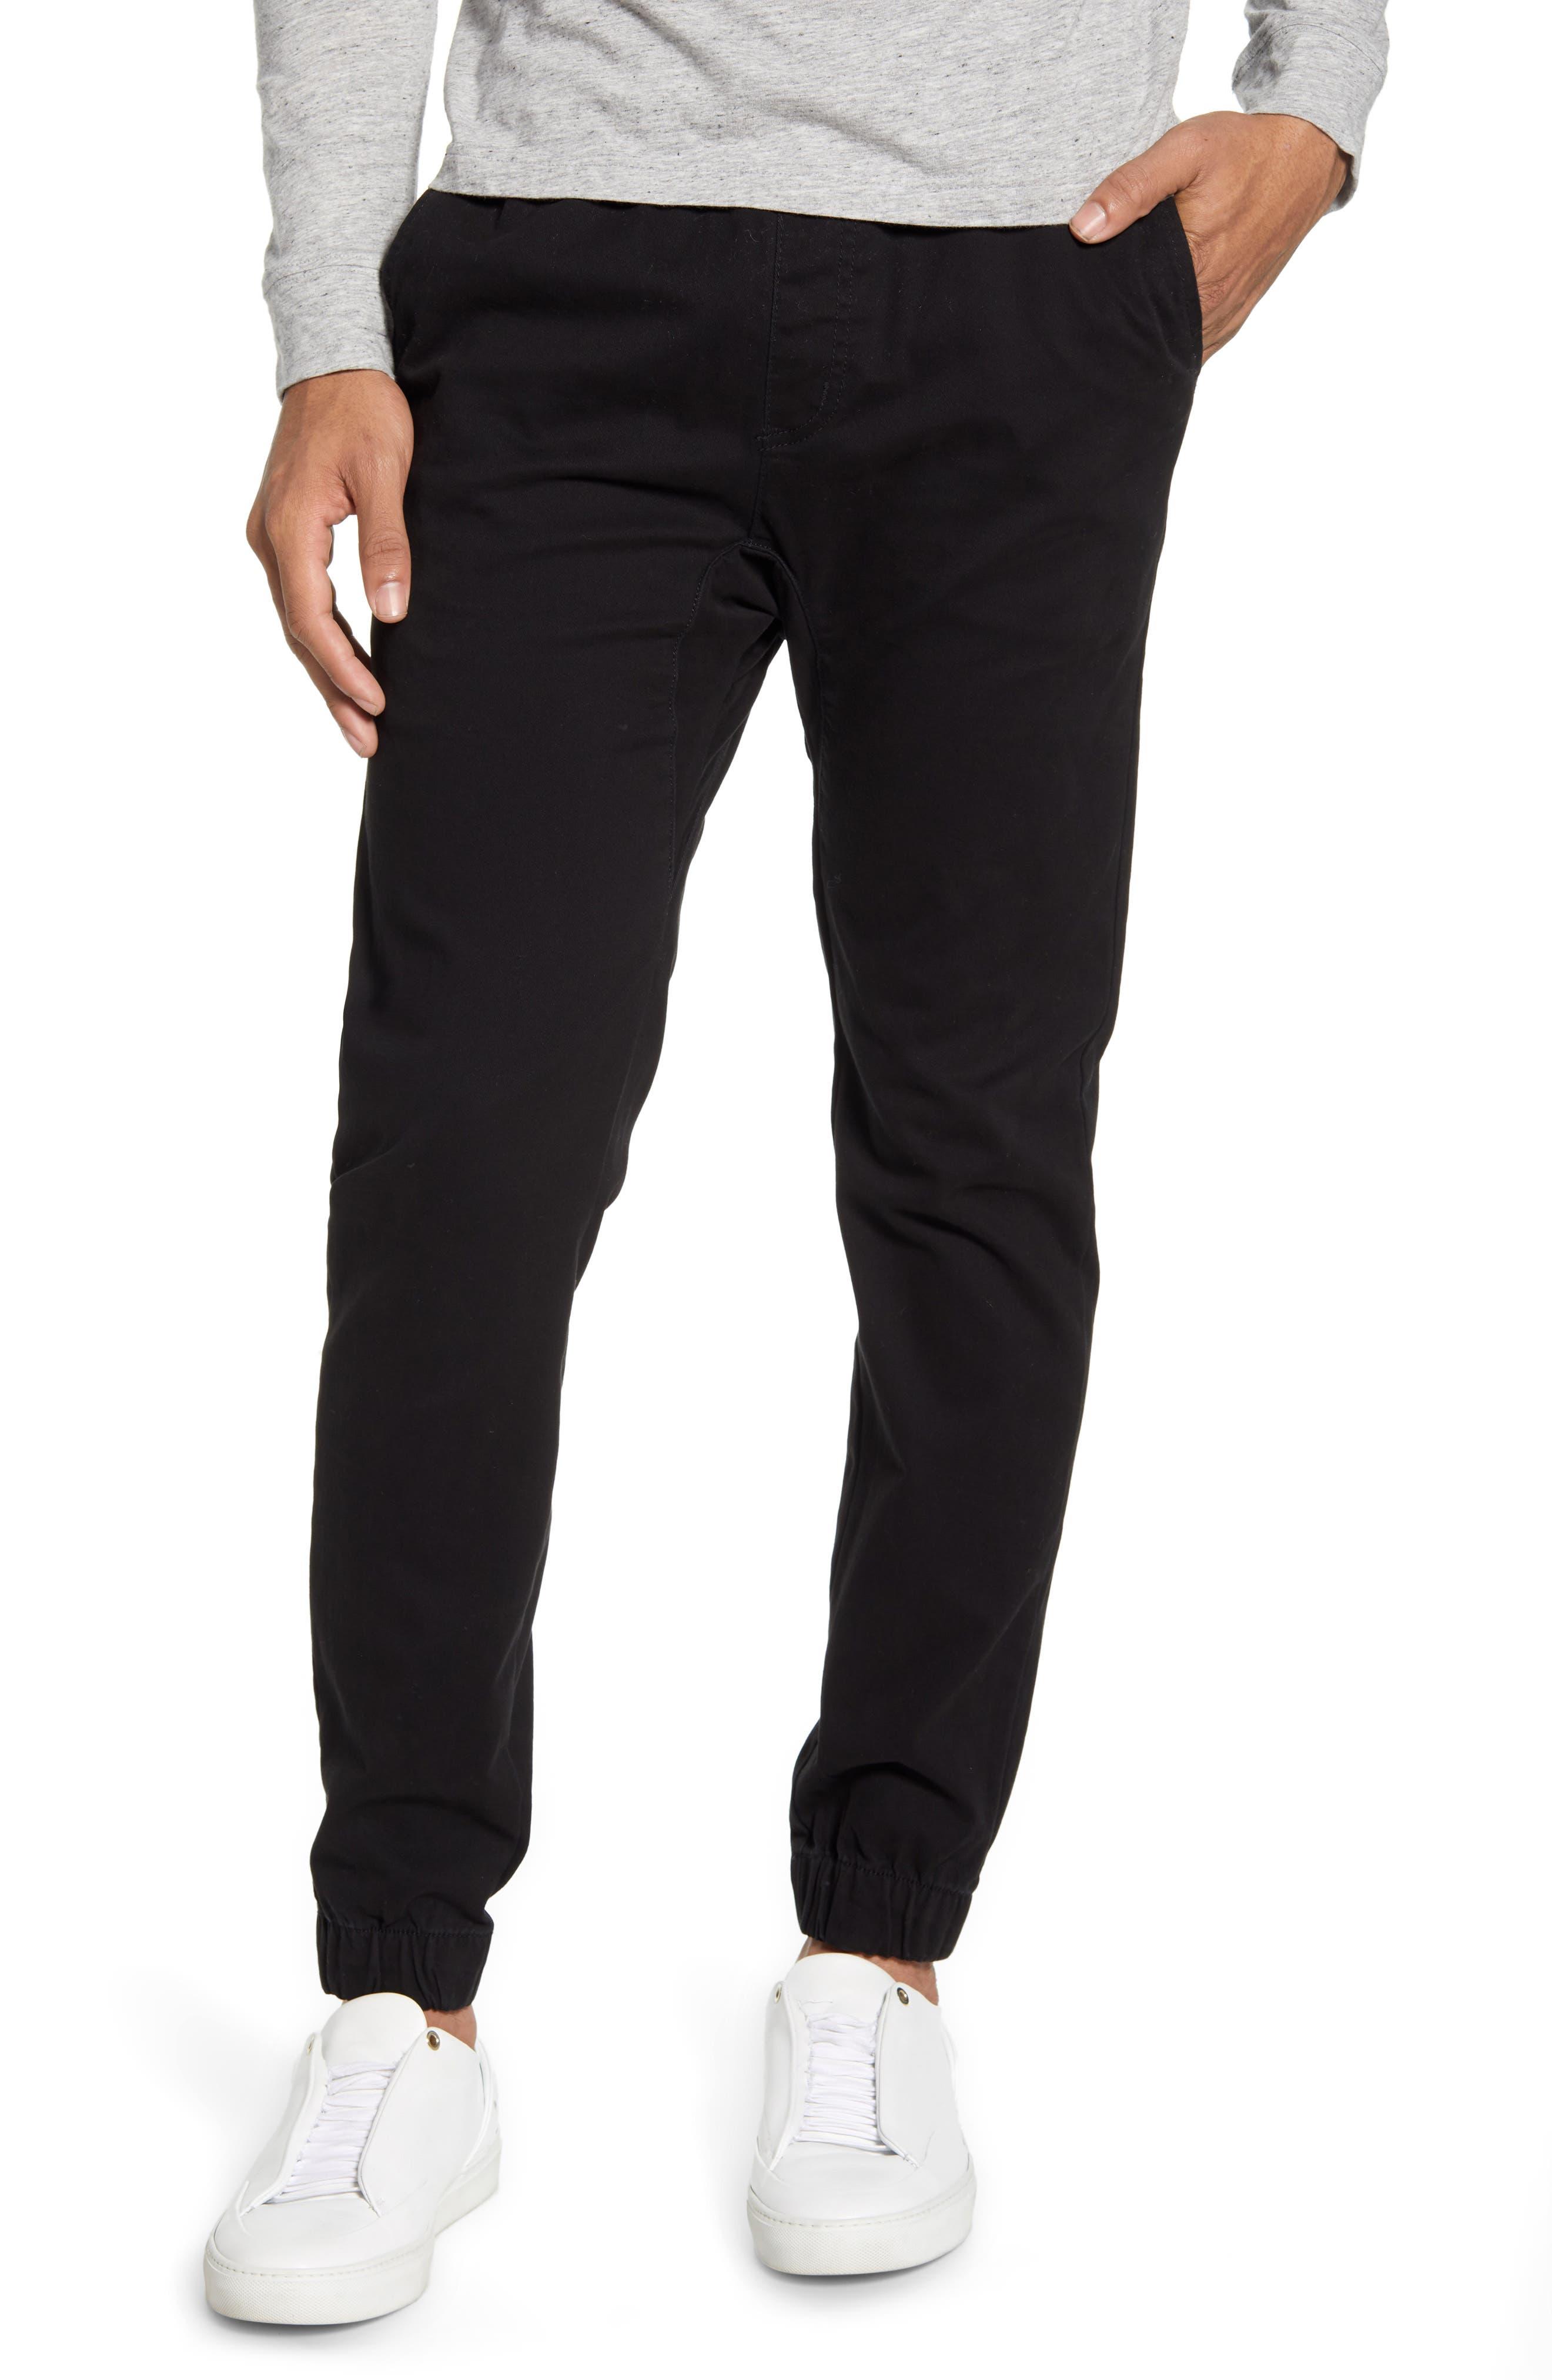 Lira Clothing Men's Lira Clothing Weekend 2.0 Jogger Pants, Size Large - Green